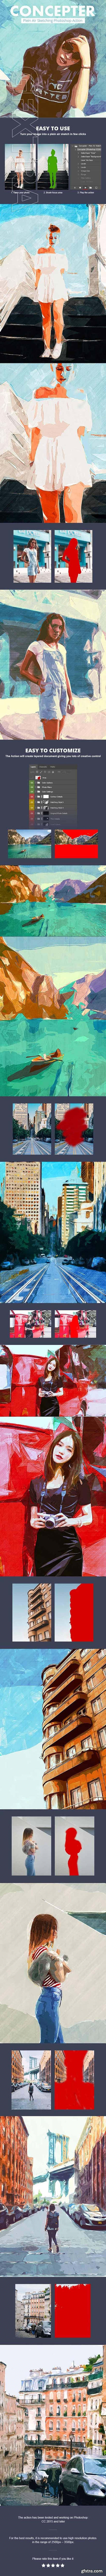 GR - Concepter - Plein Air Sketch Photoshop Action 22013742